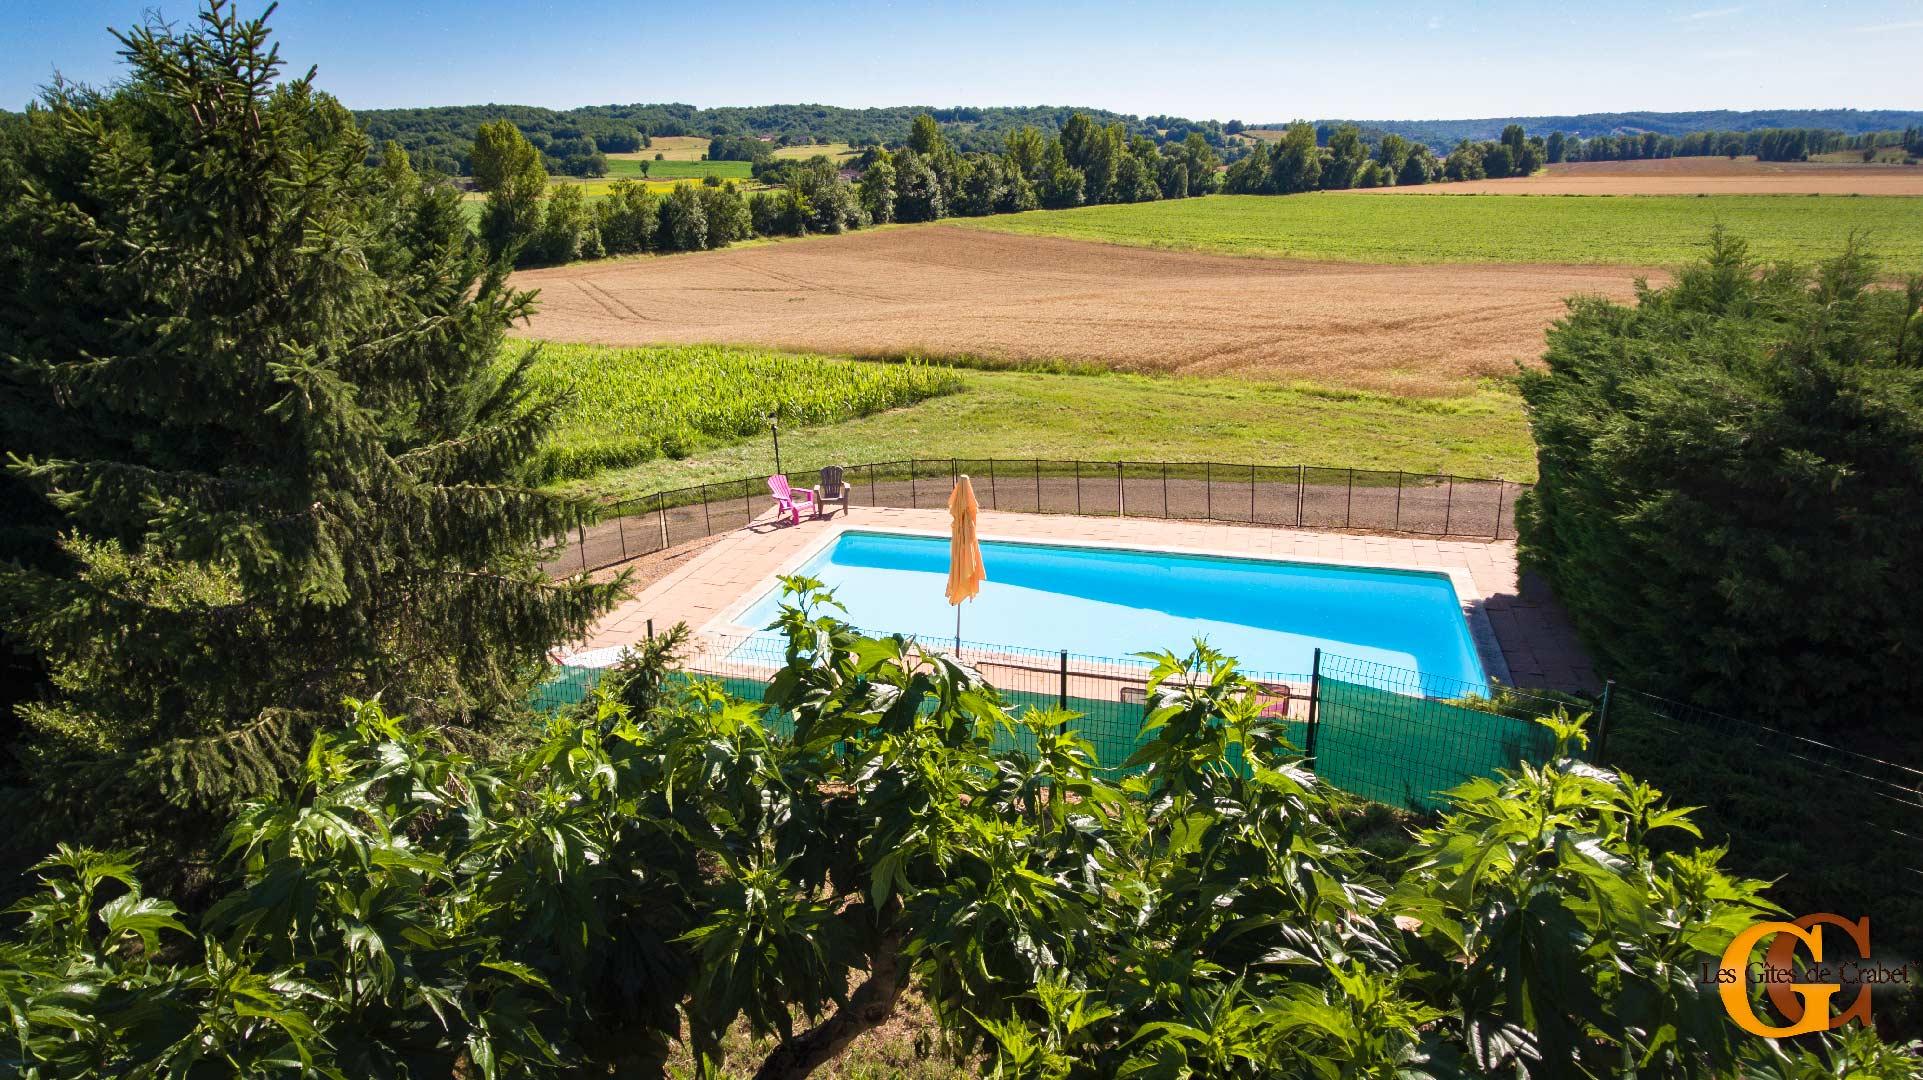 location-gite-campagne-avec-piscine